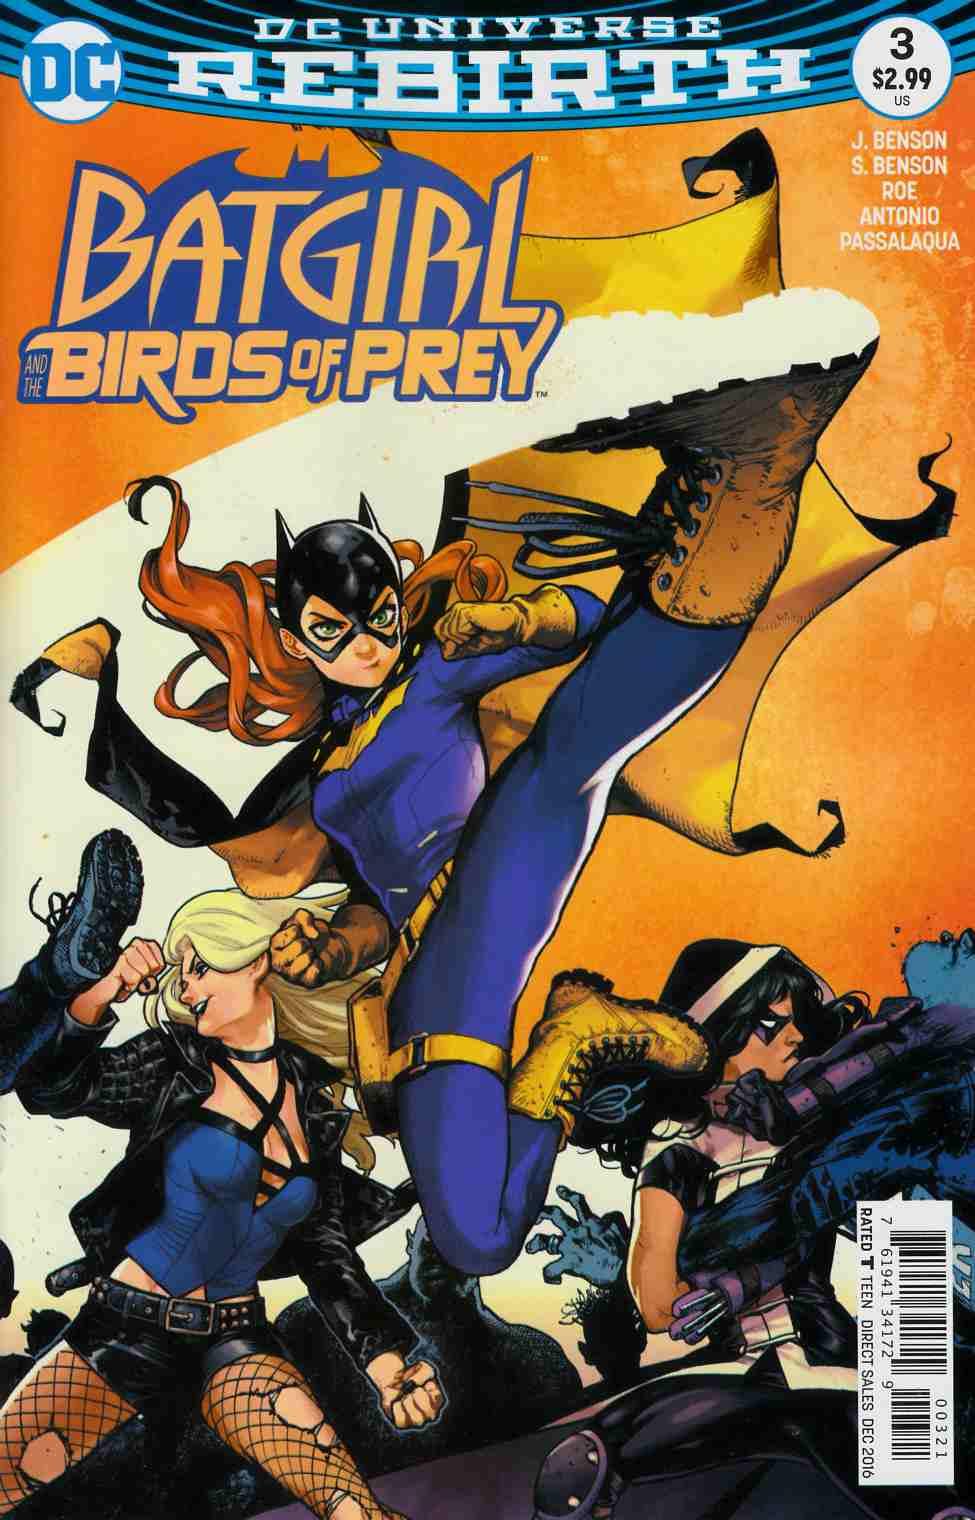 Batgirl And The Birds Of Prey 3 Shirahama Variant Cover Dc Comic Dreamlandcomics Com Online Store